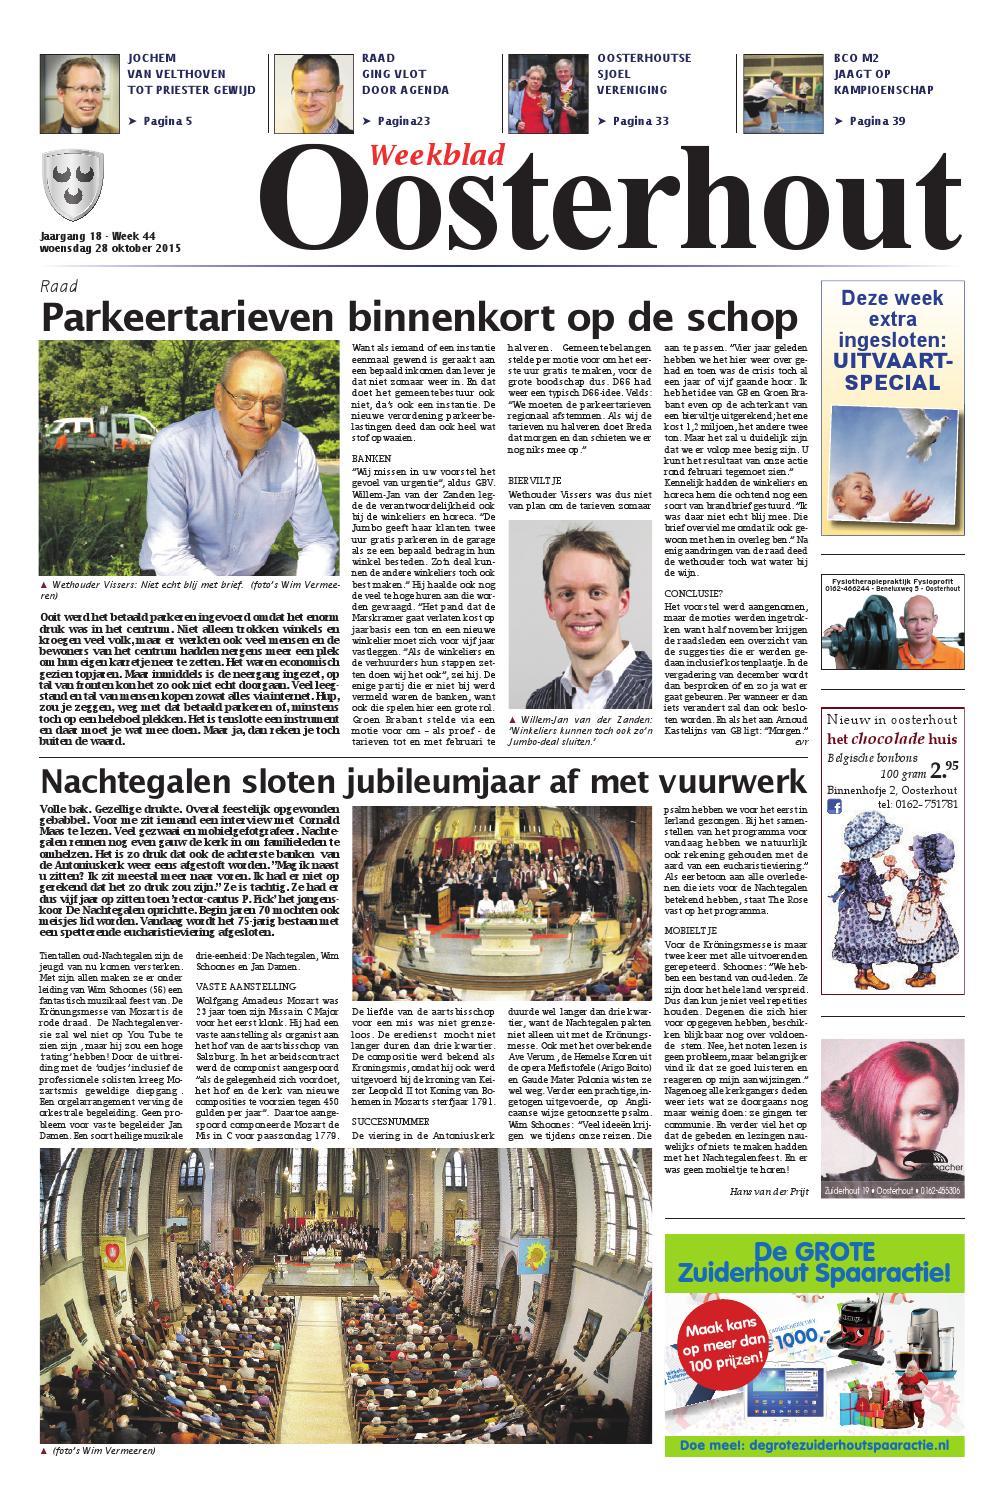 Weekblad Oosterhout 28 10 2015 By Uitgeverij Em De Jong Issuu